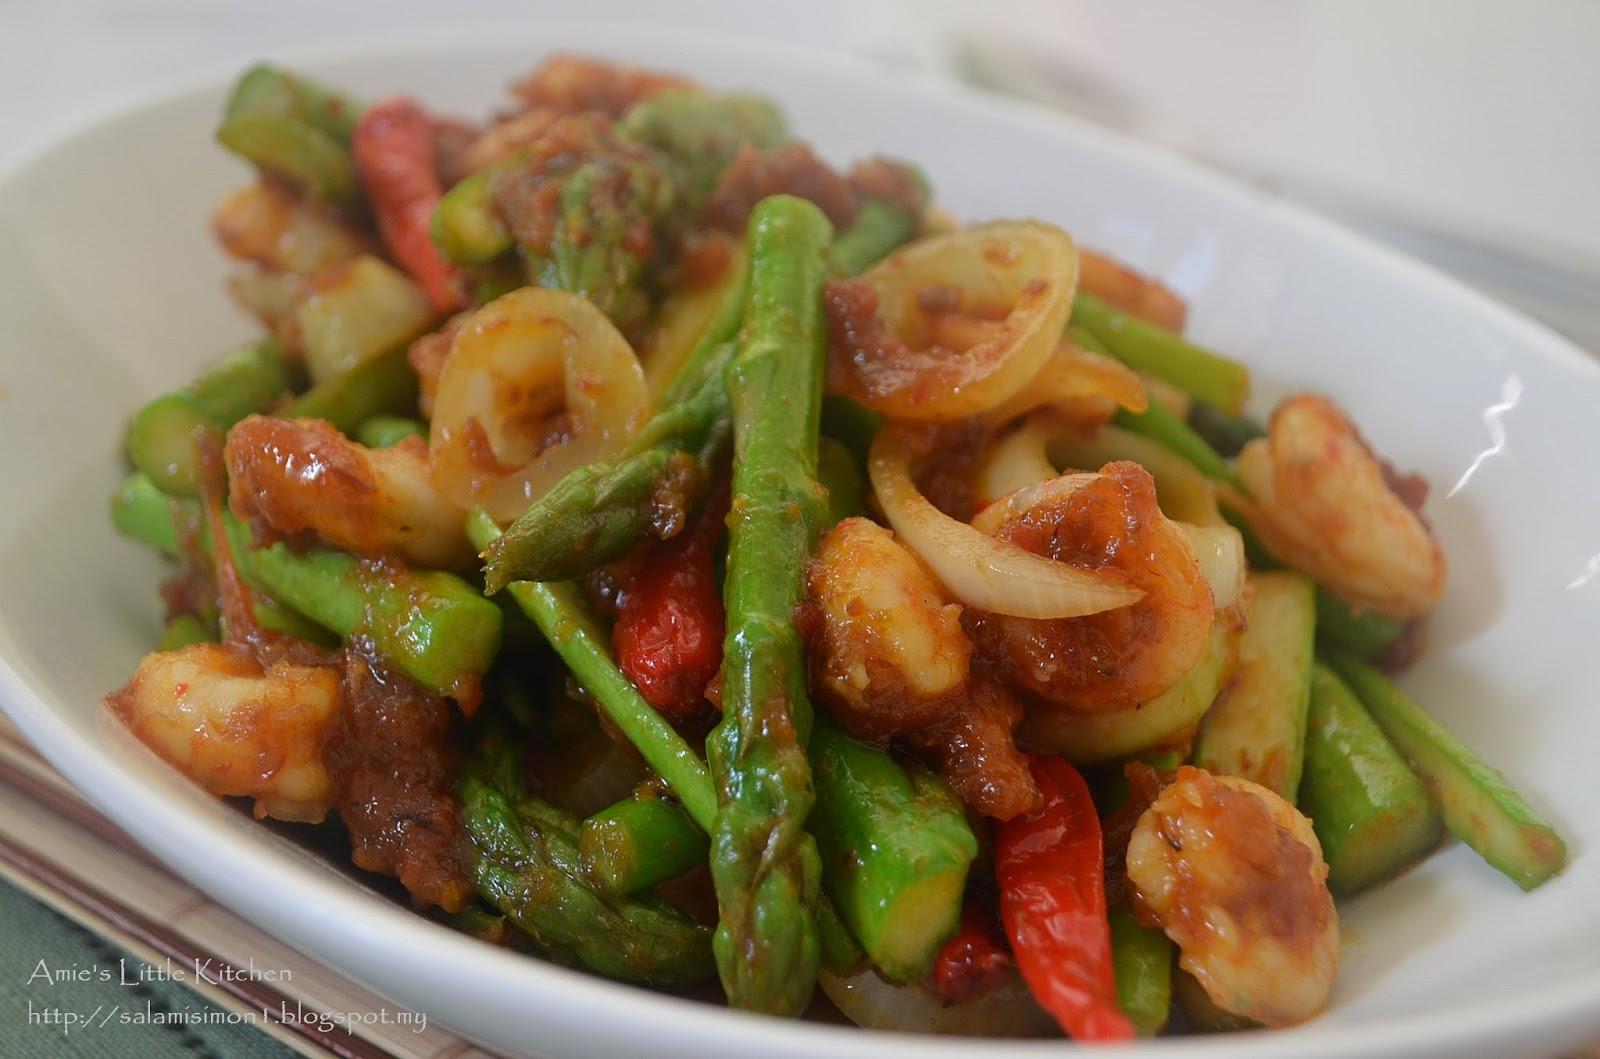 Amie S Little Kitchen Asparagus Tumis Pedas